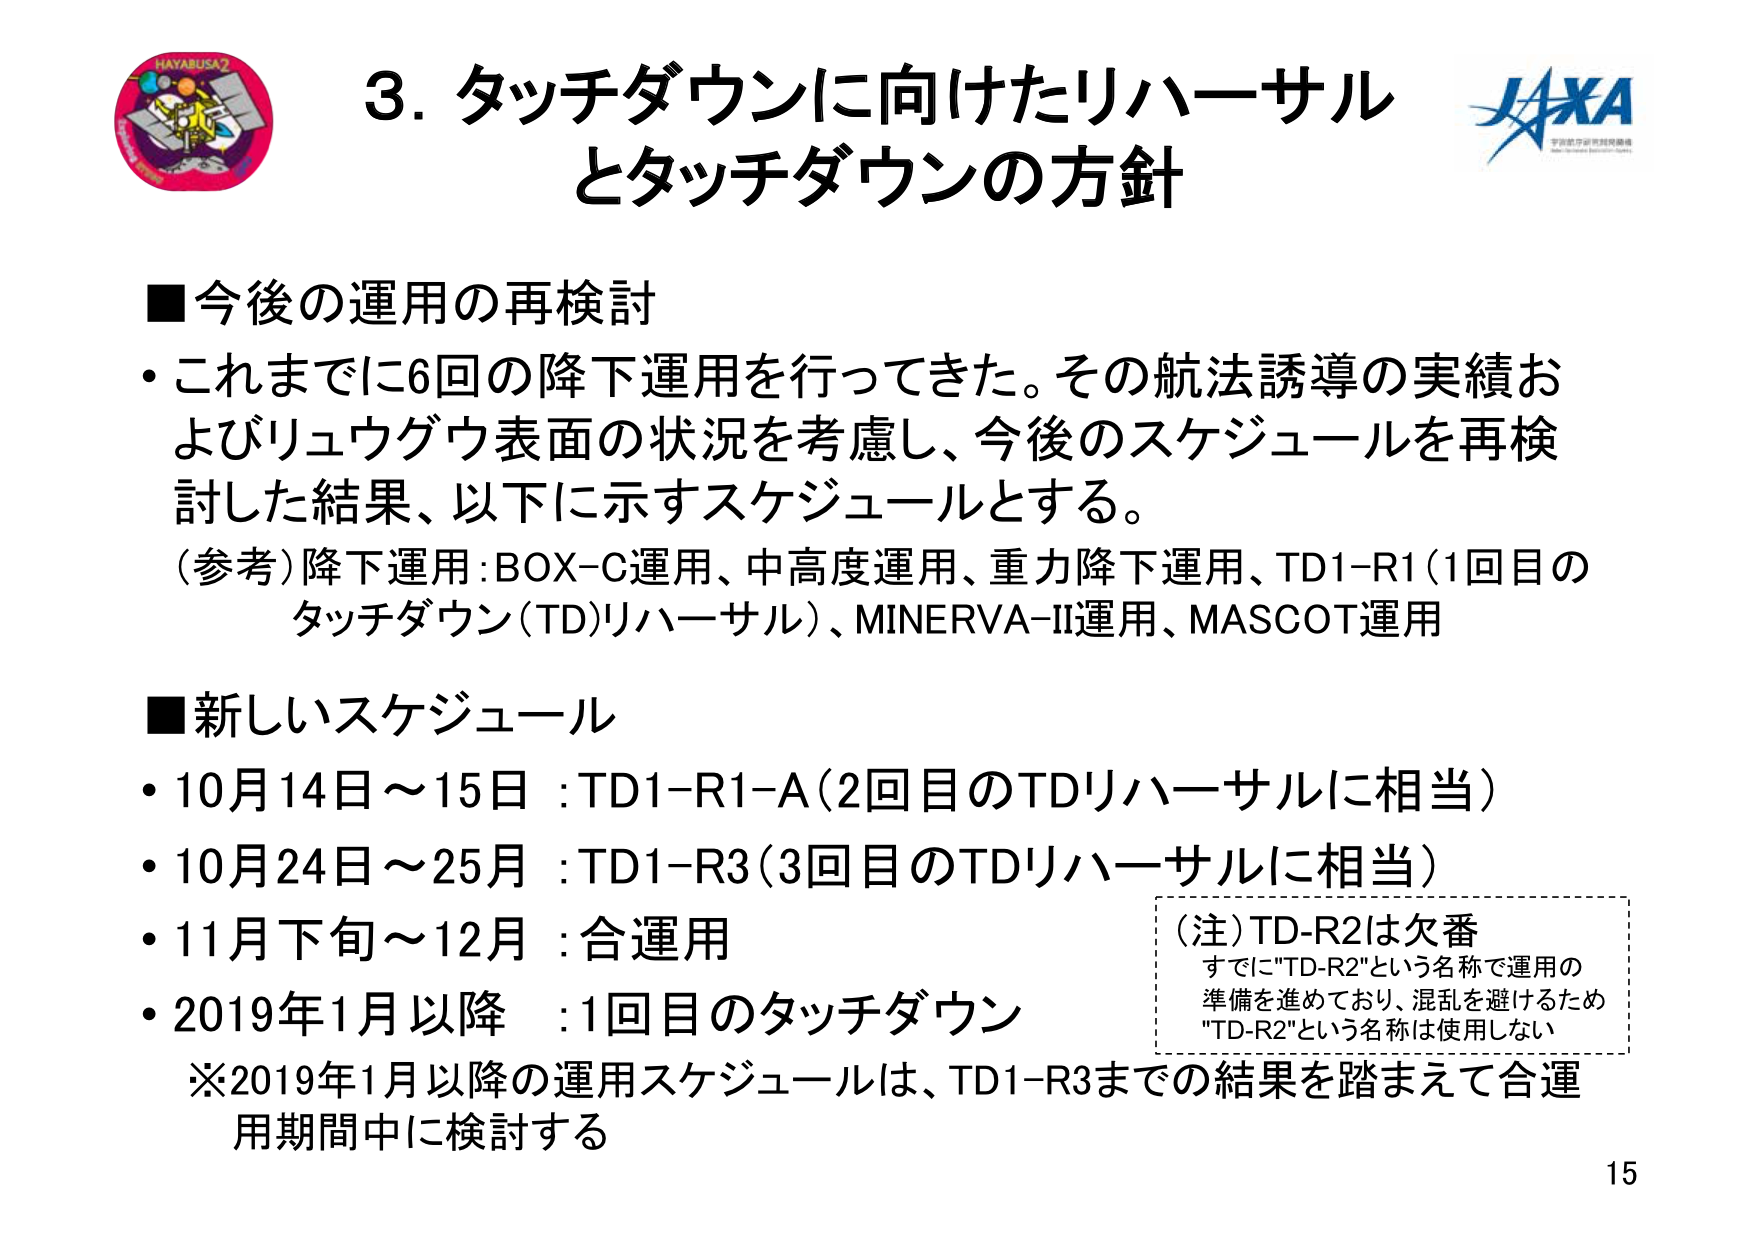 f:id:Imamura:20181011153954p:plain